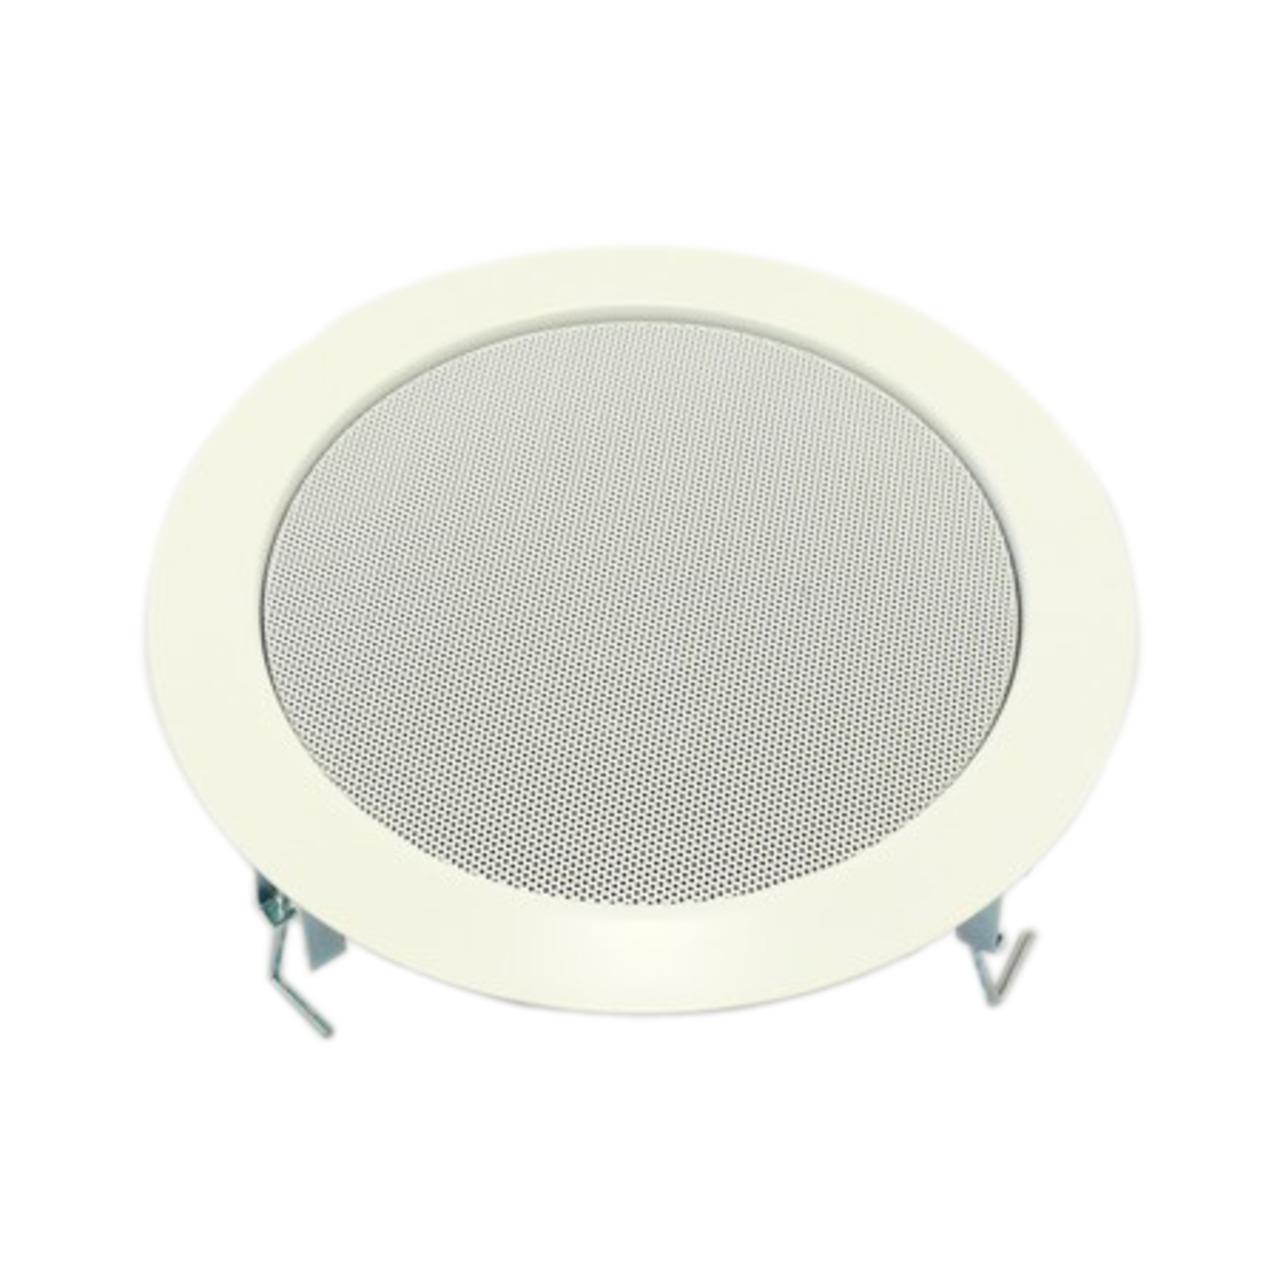 VISATON Hi-Fi-Deckenlautsprecher 20cm- DL 18-2 T - 8 Ohm